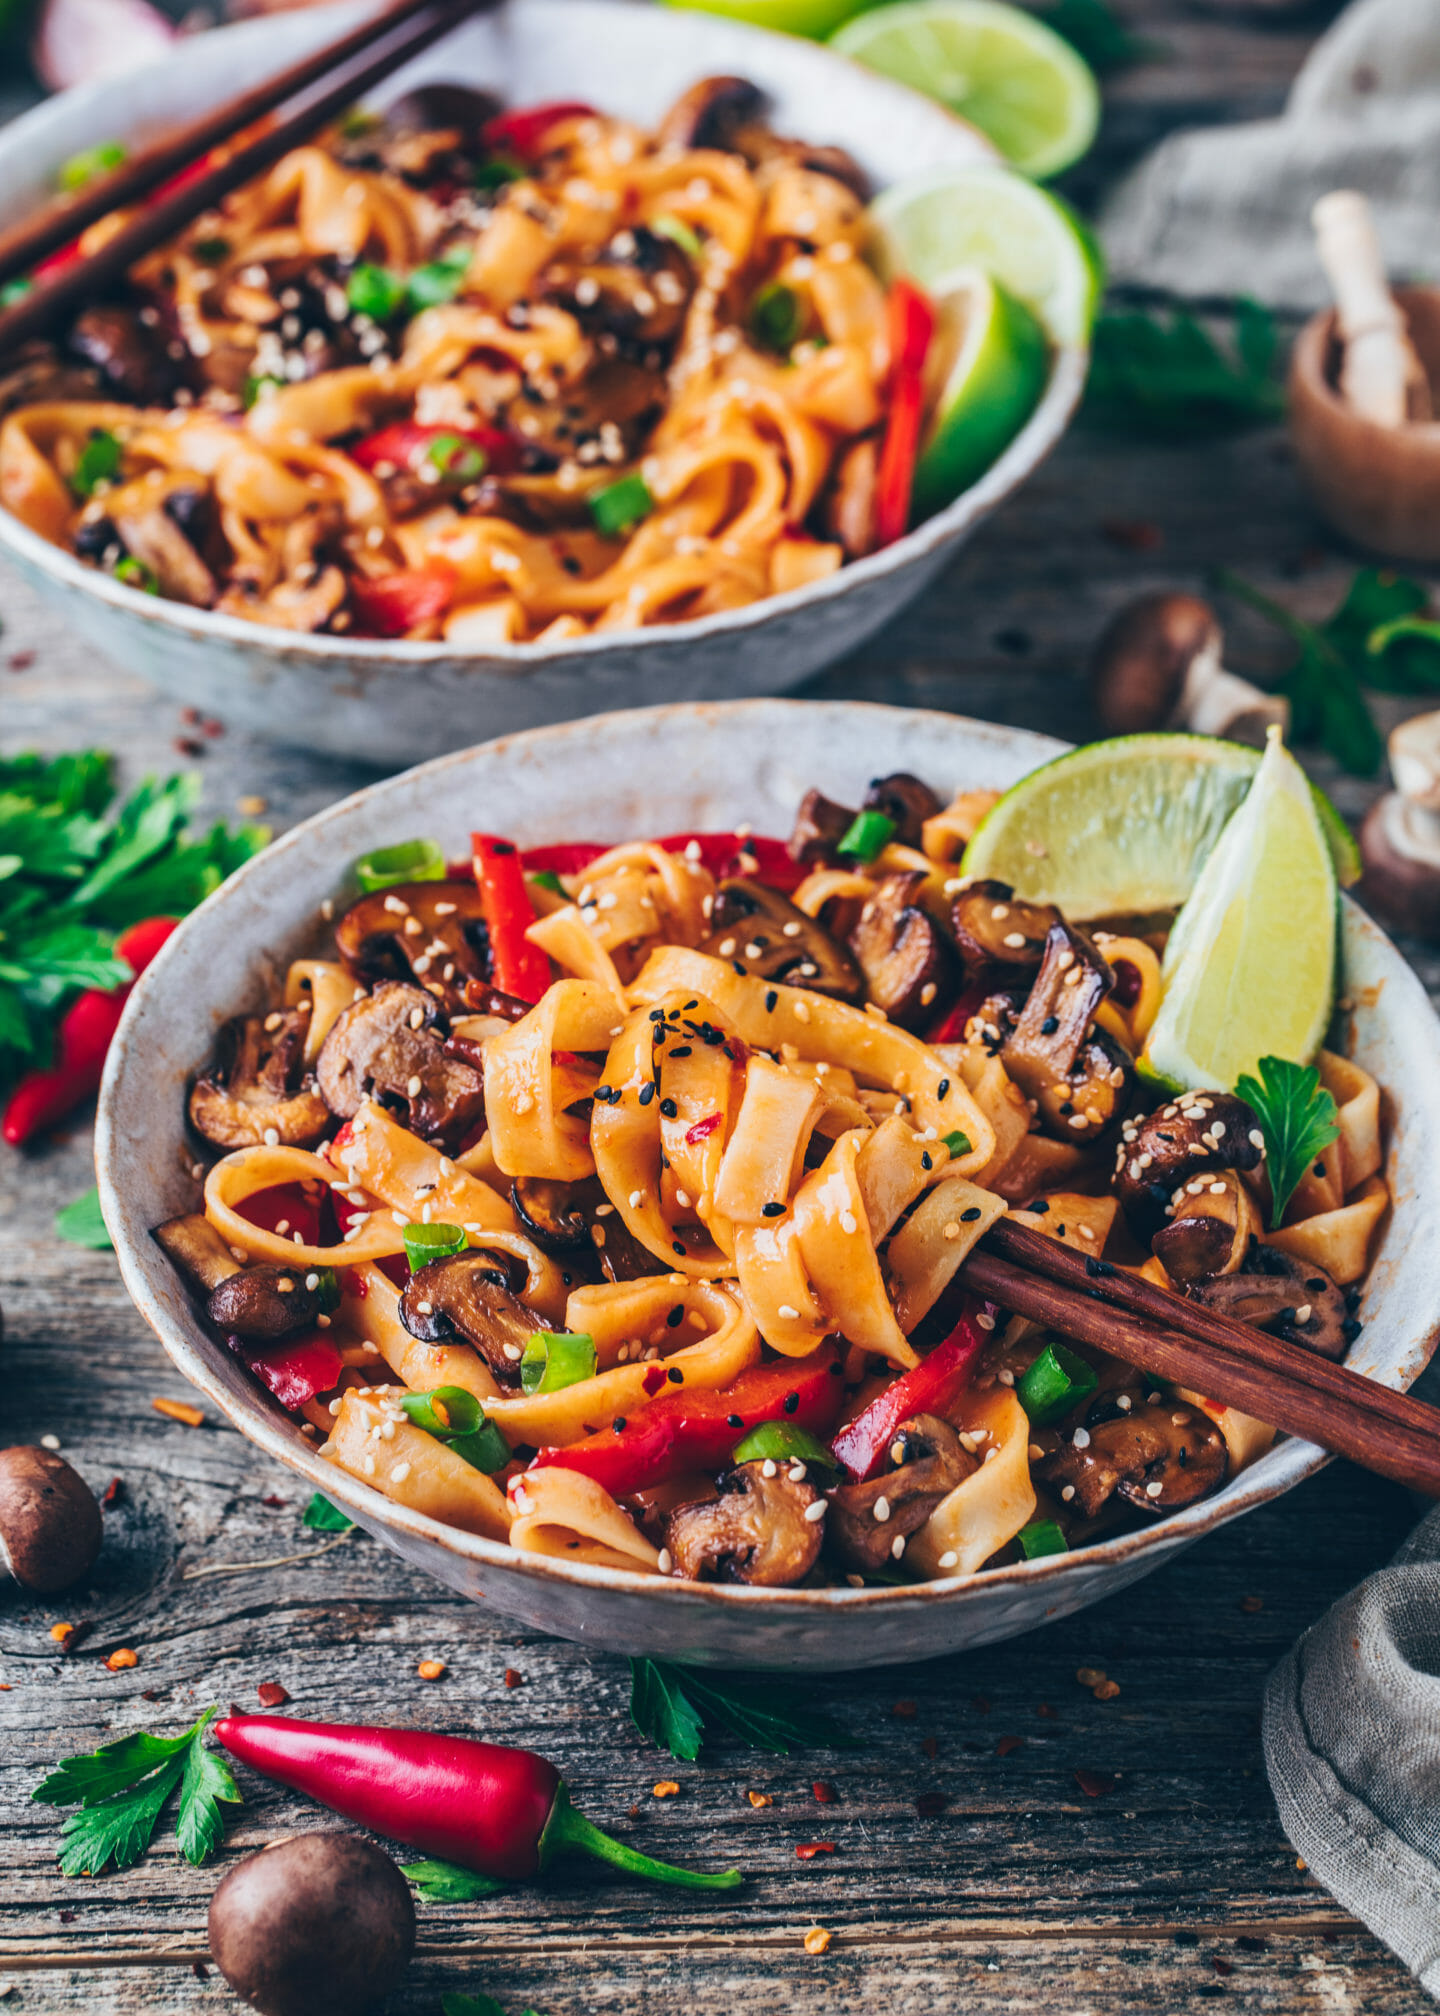 Asian Noodles (Thai vegetable Stir-fry)